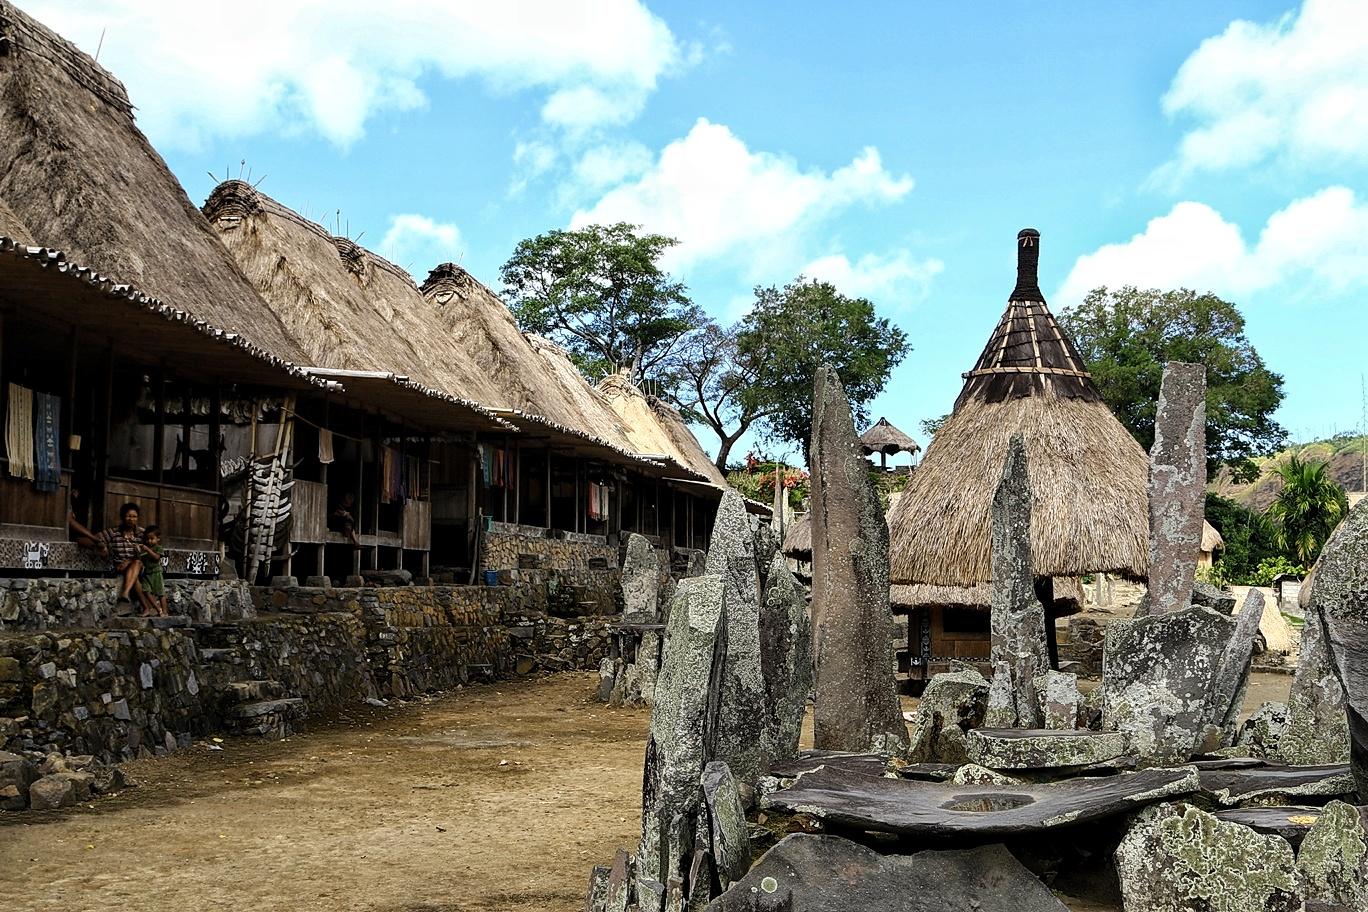 Altar Adat Yang Menunjukkan Budaya Megalitikum Kampung Bena